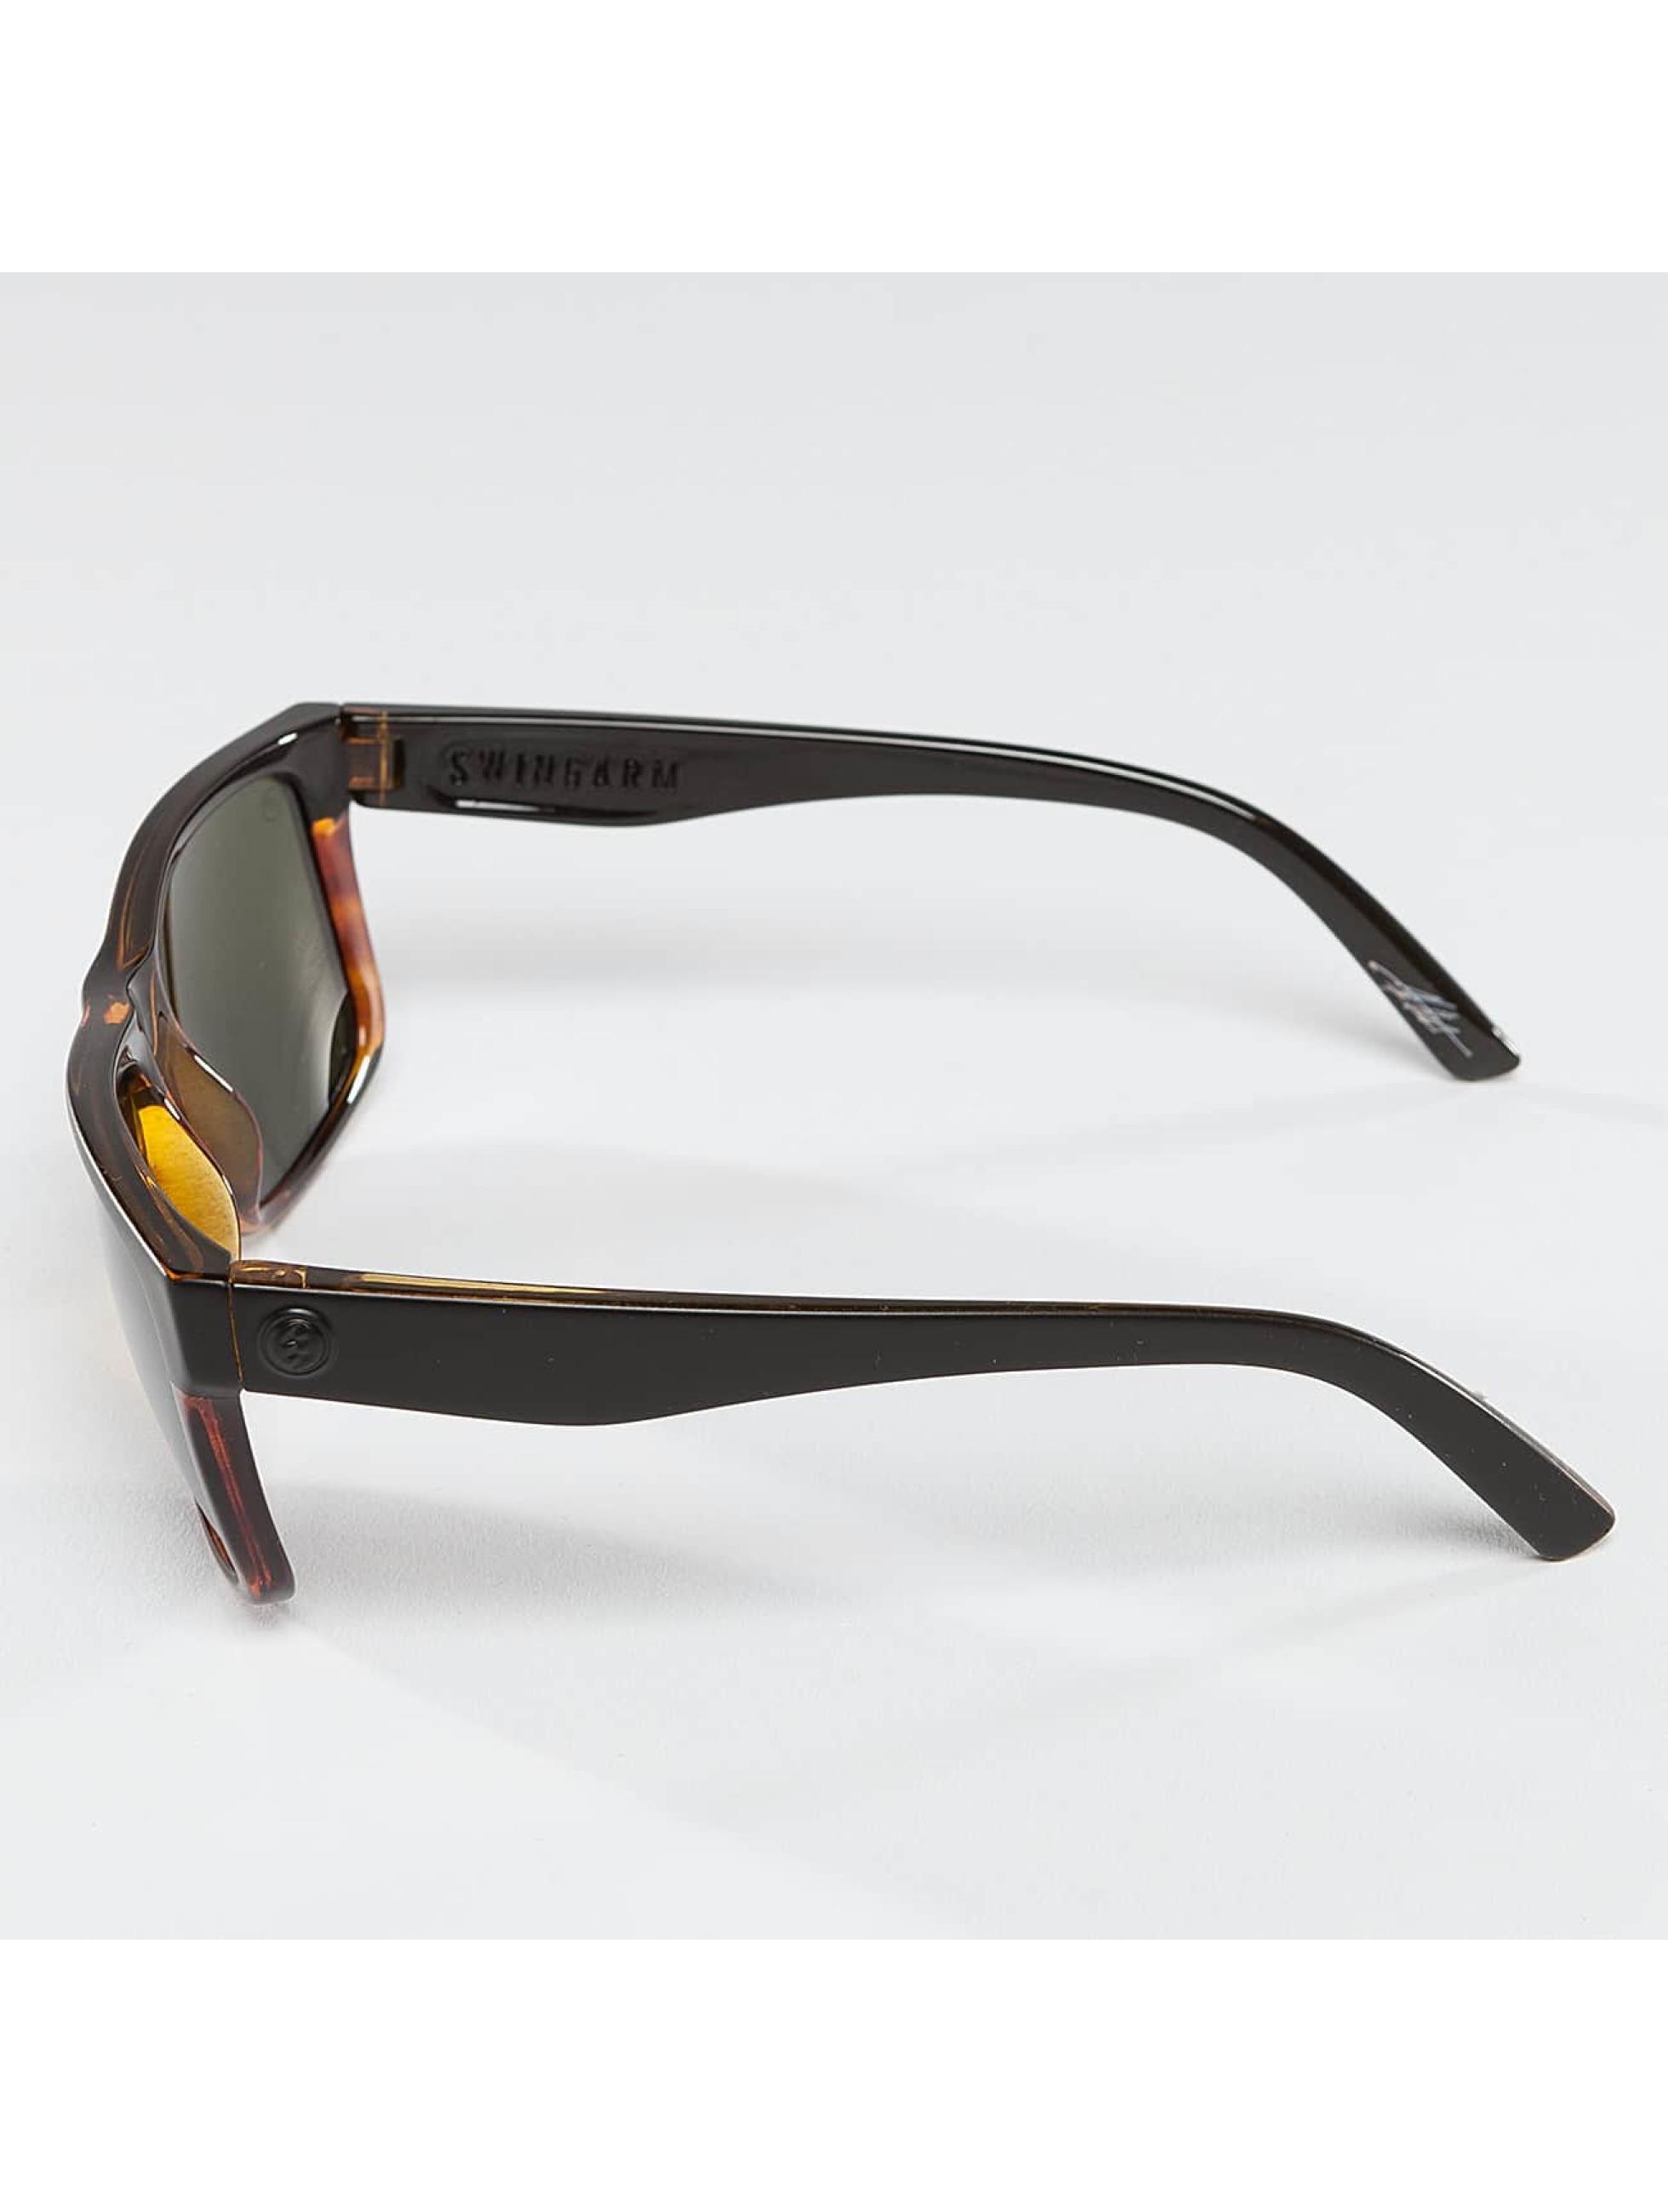 Electric Sunglasses Swingarm brown